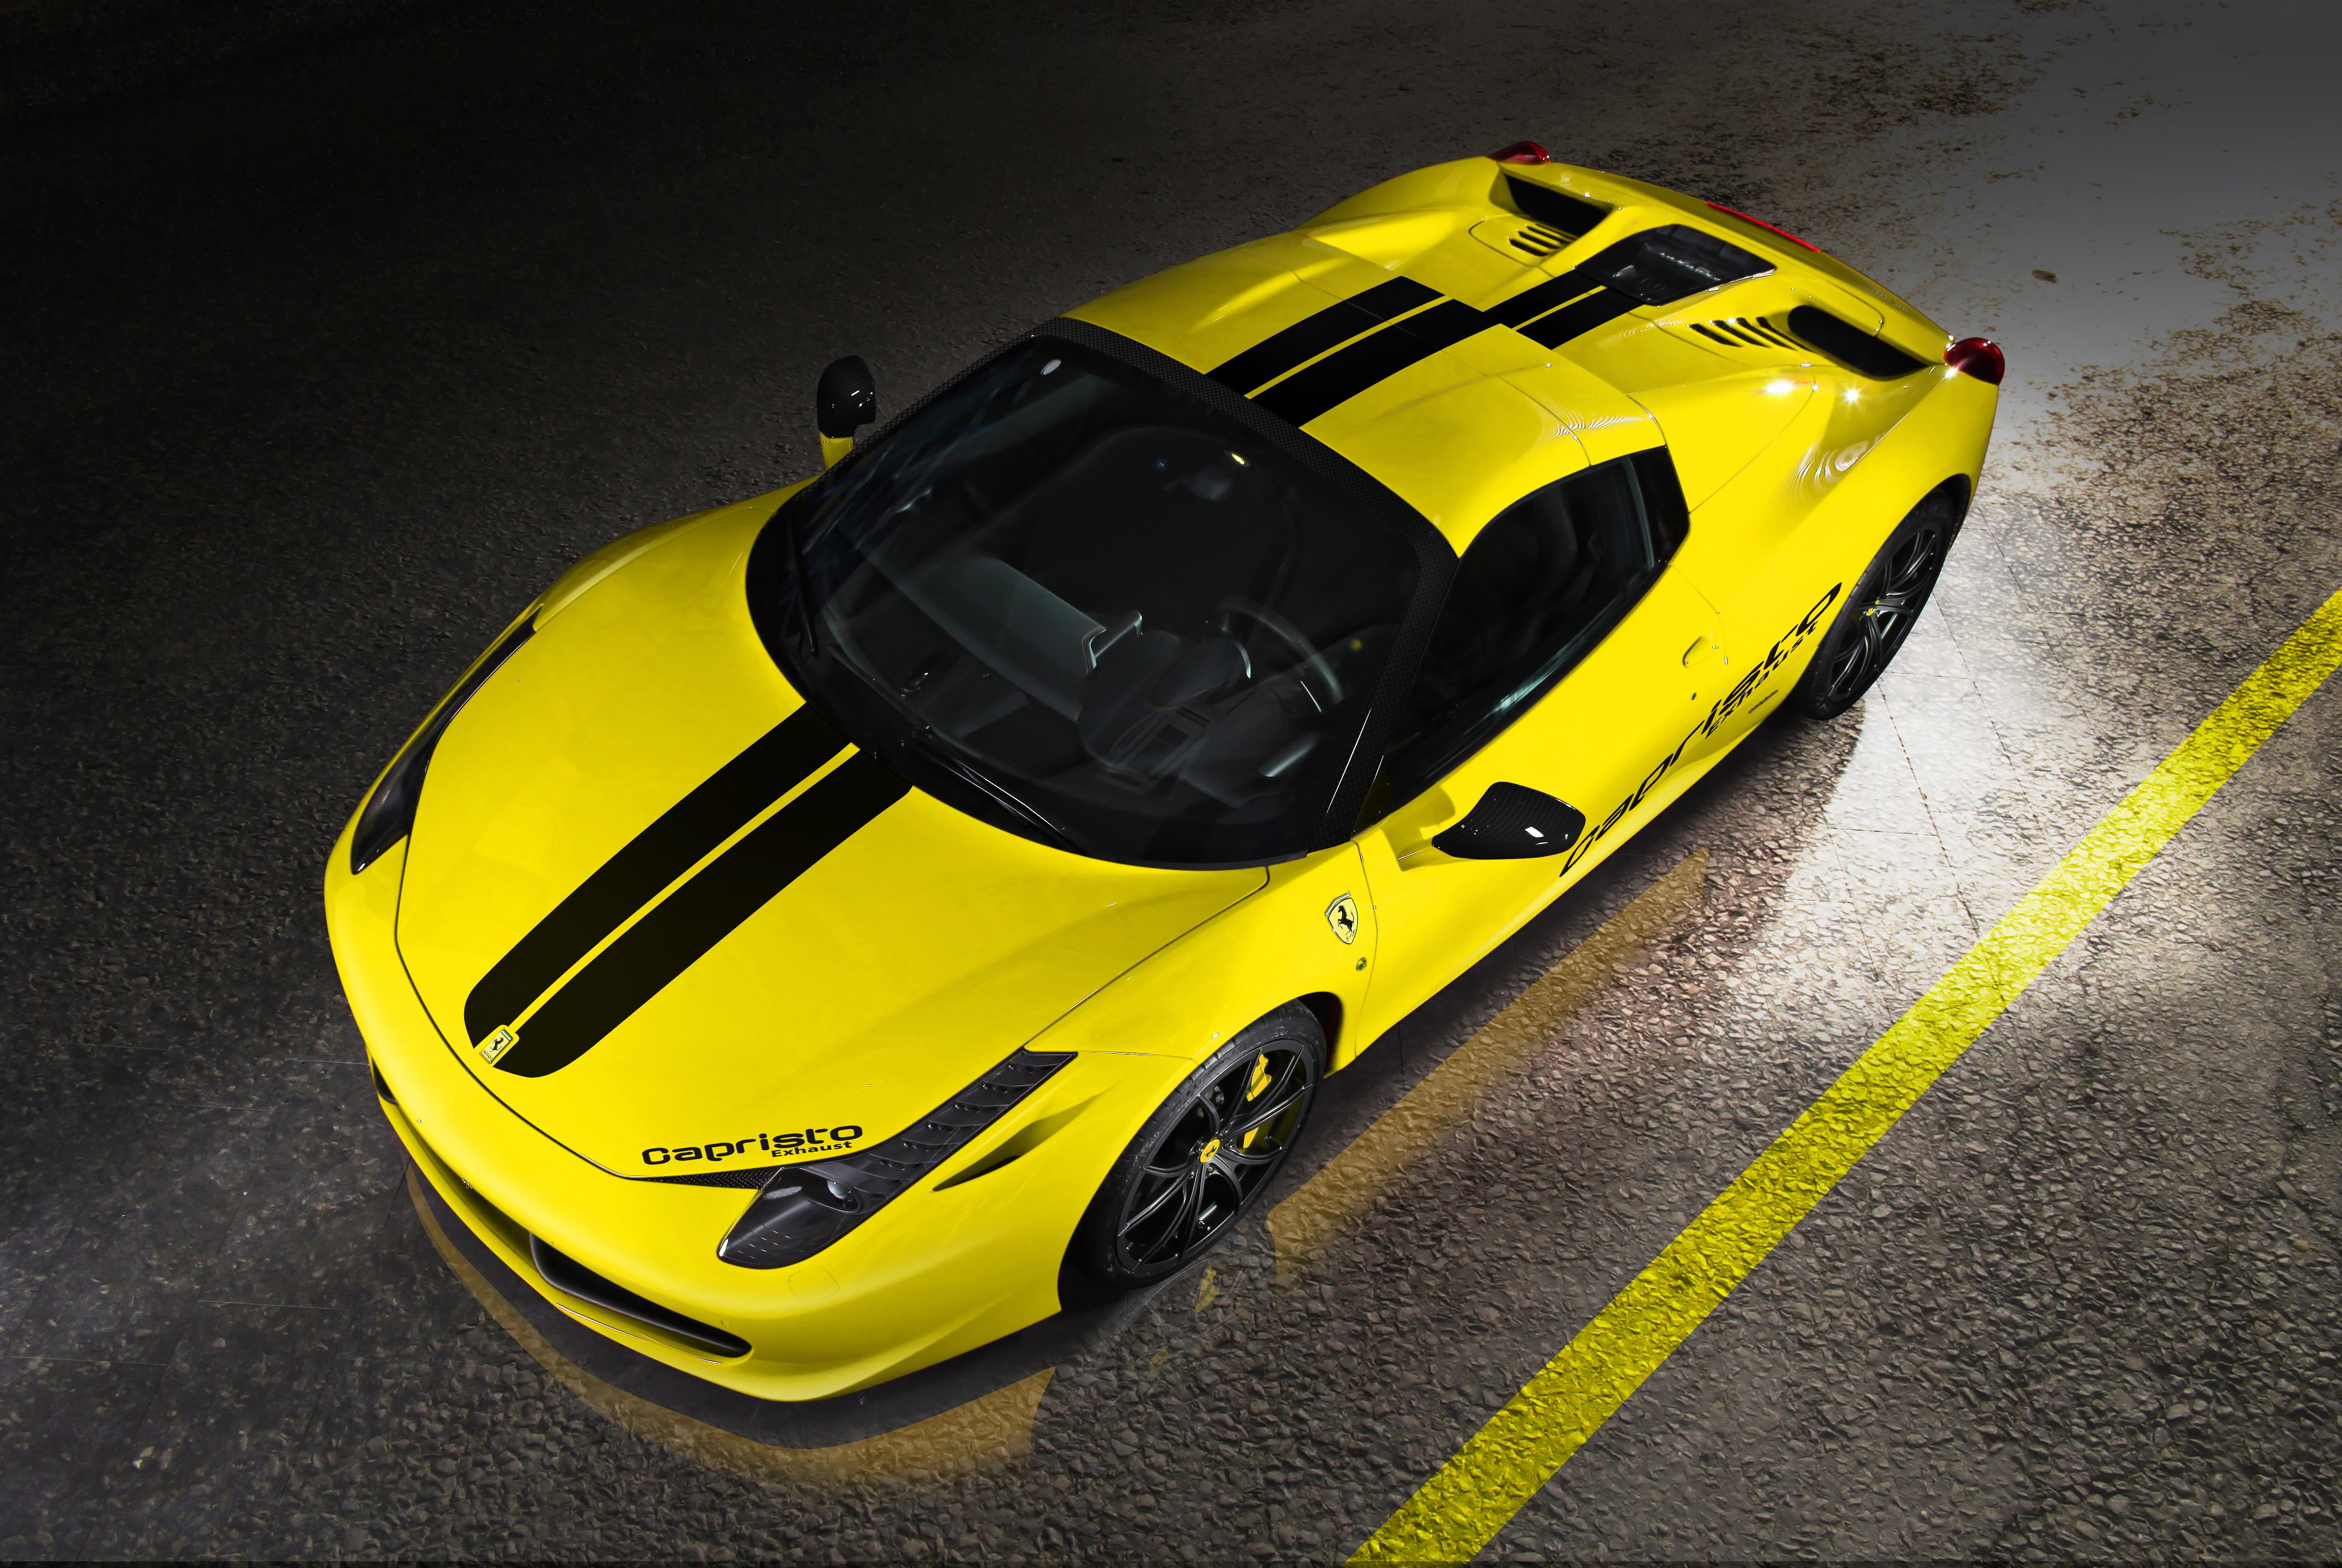 120174 download wallpaper Ferrari, Cars, Spider, 458 Italia, Capristo screensavers and pictures for free